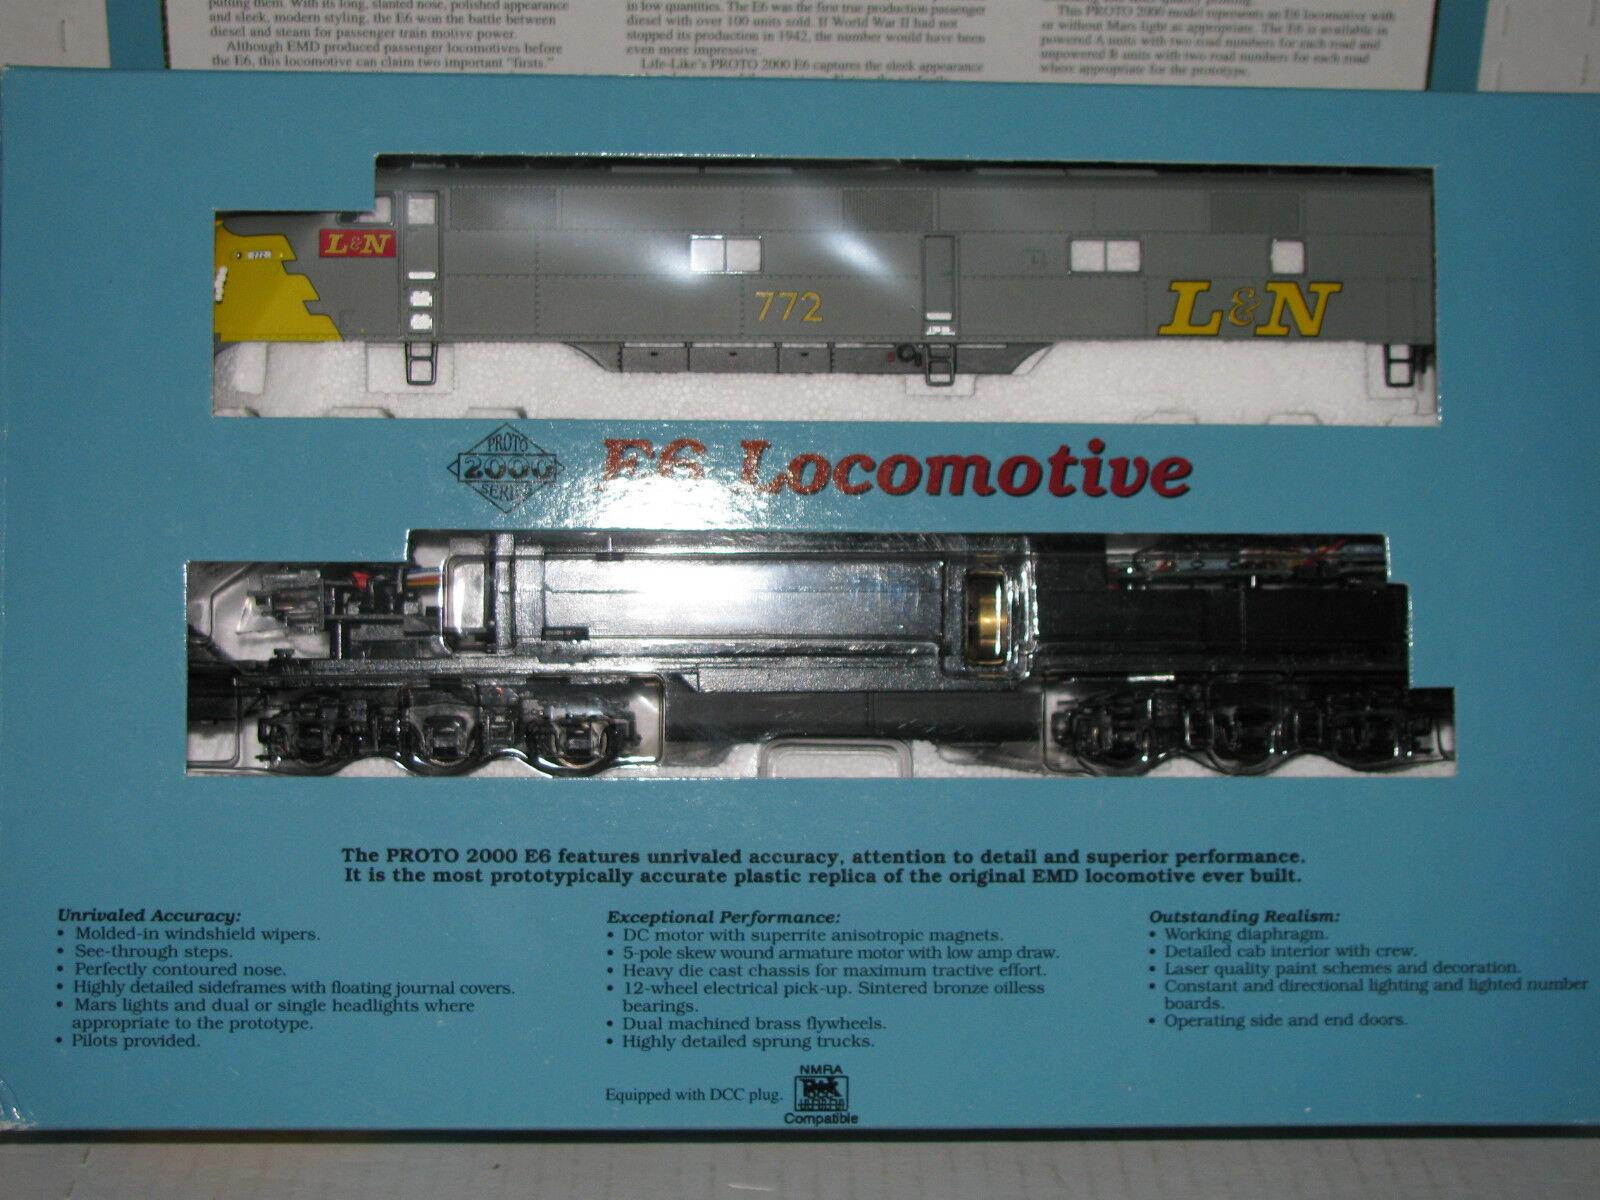 Life Like Proto 2000 HO scale  23190 Louisville & Nashville E6 Locomotive  772